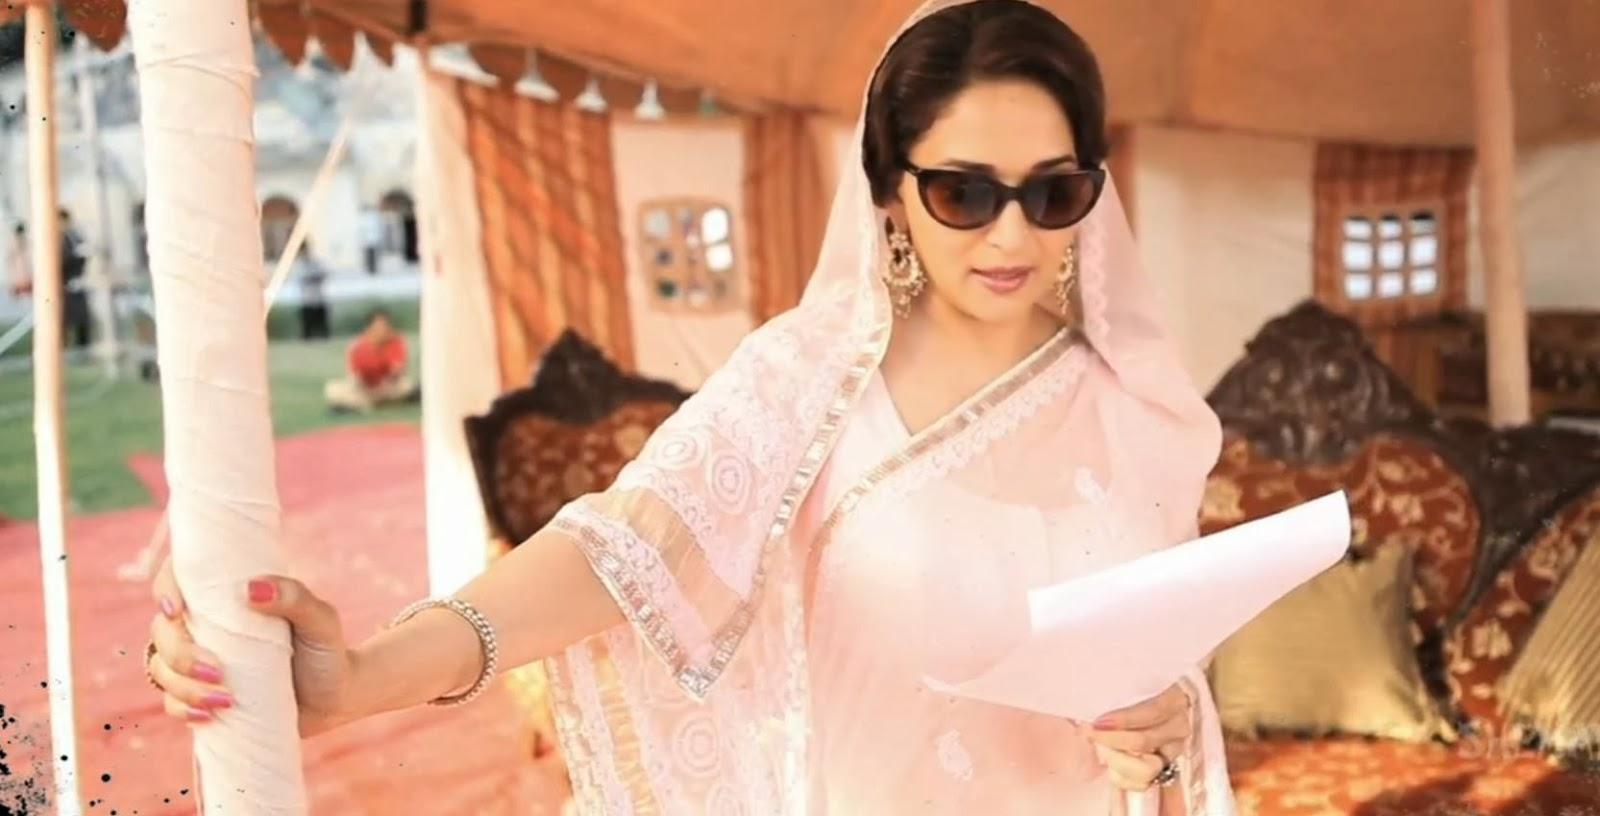 Dedh Ishqiya style guide - Madhuri Dixit-Nene in a gorgeous pink lucknowi sari